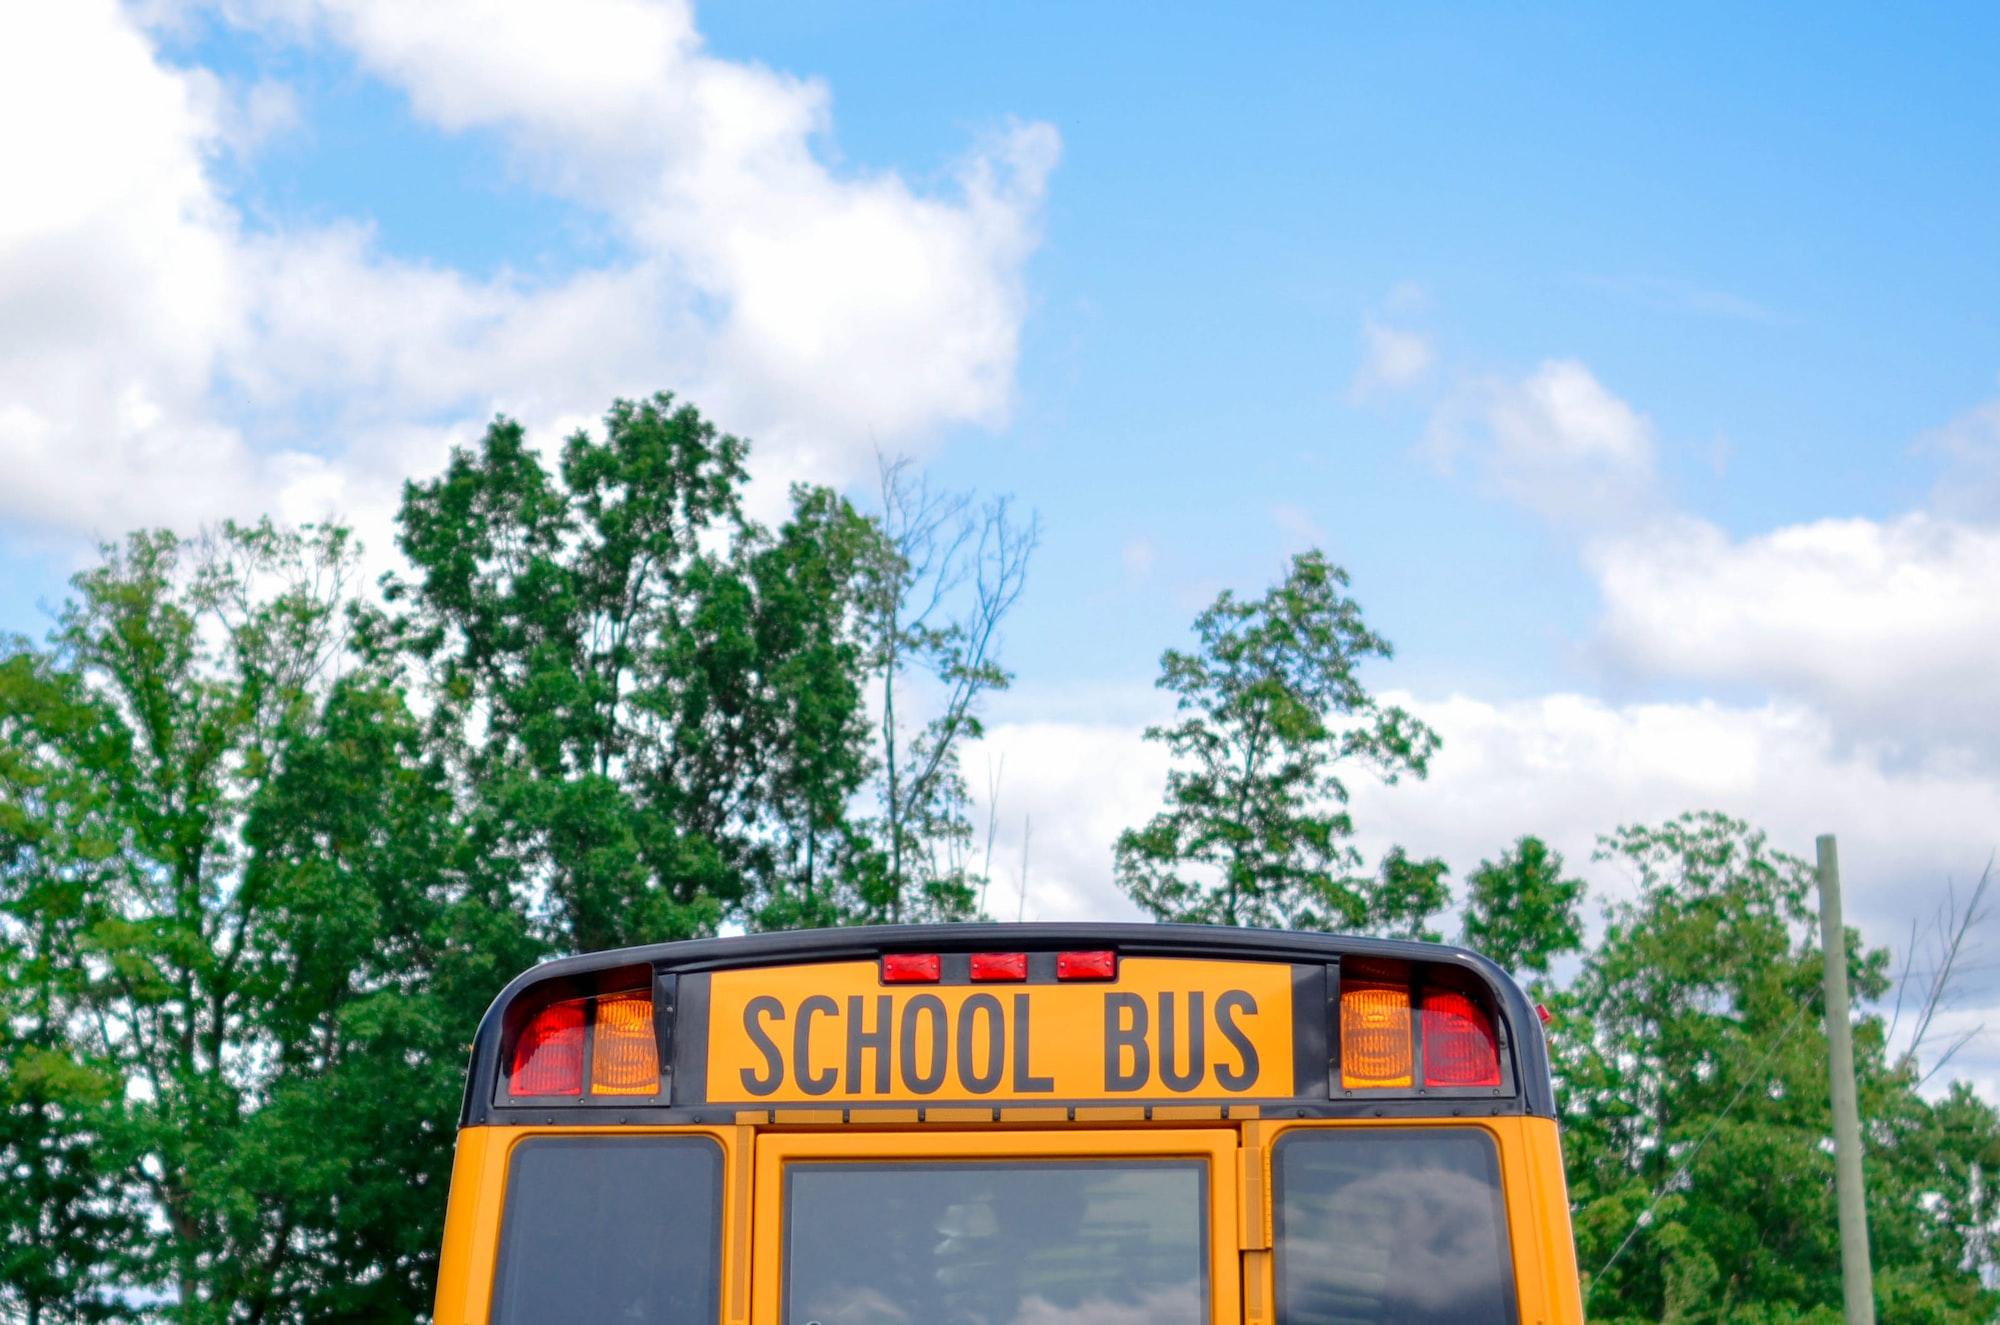 Schools lost kids last year. Has enrollment rebounded?